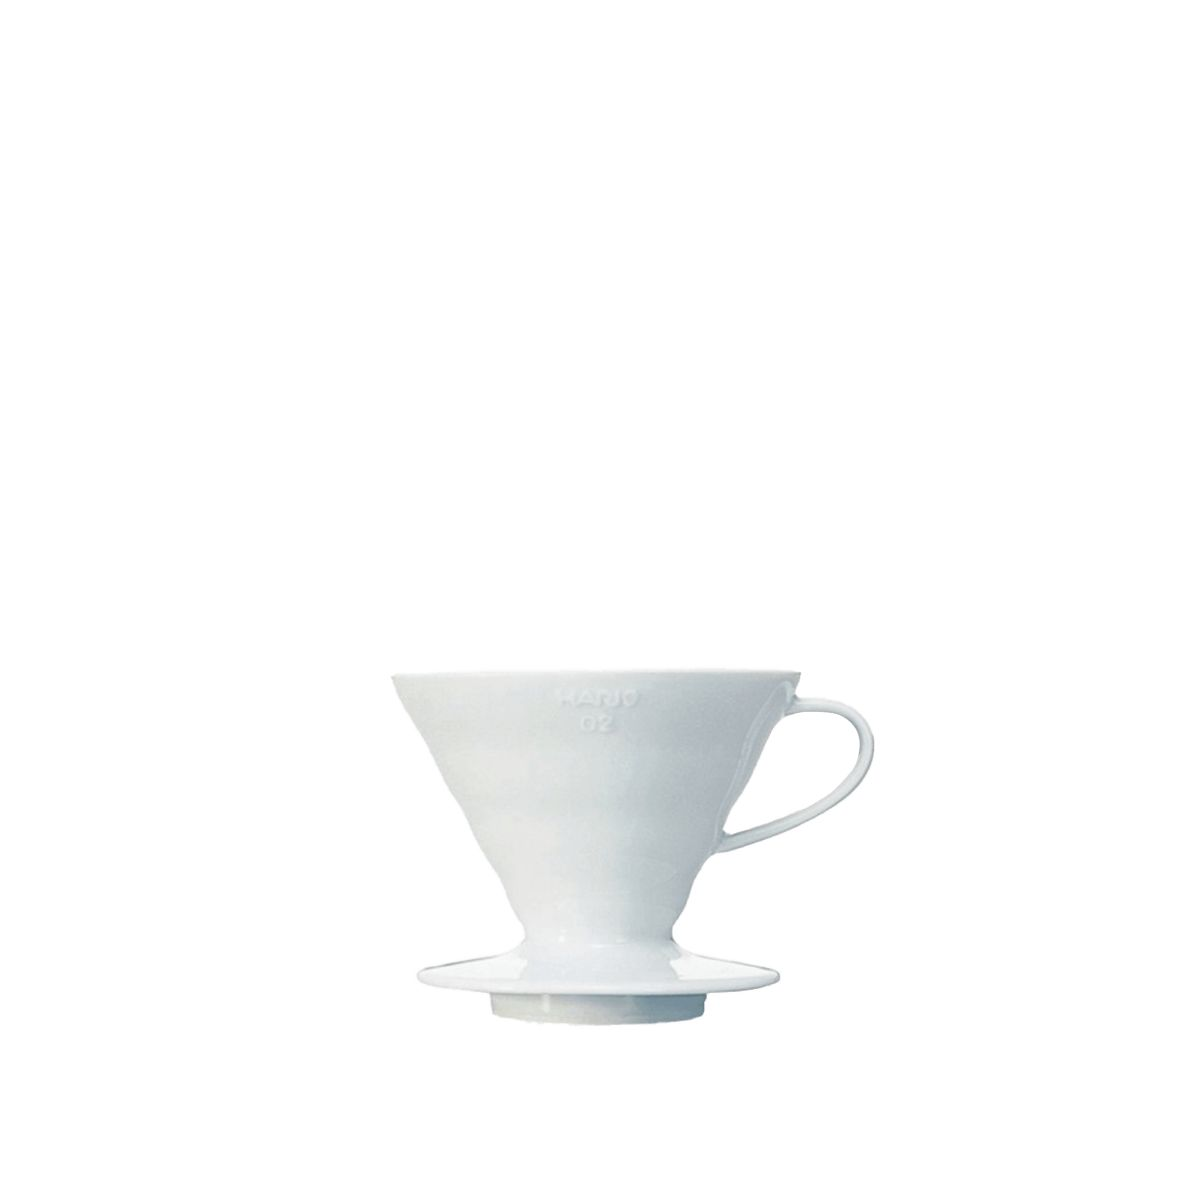 V60 Dripper Hario Porzellan [3/4 Tassen] - Weiss